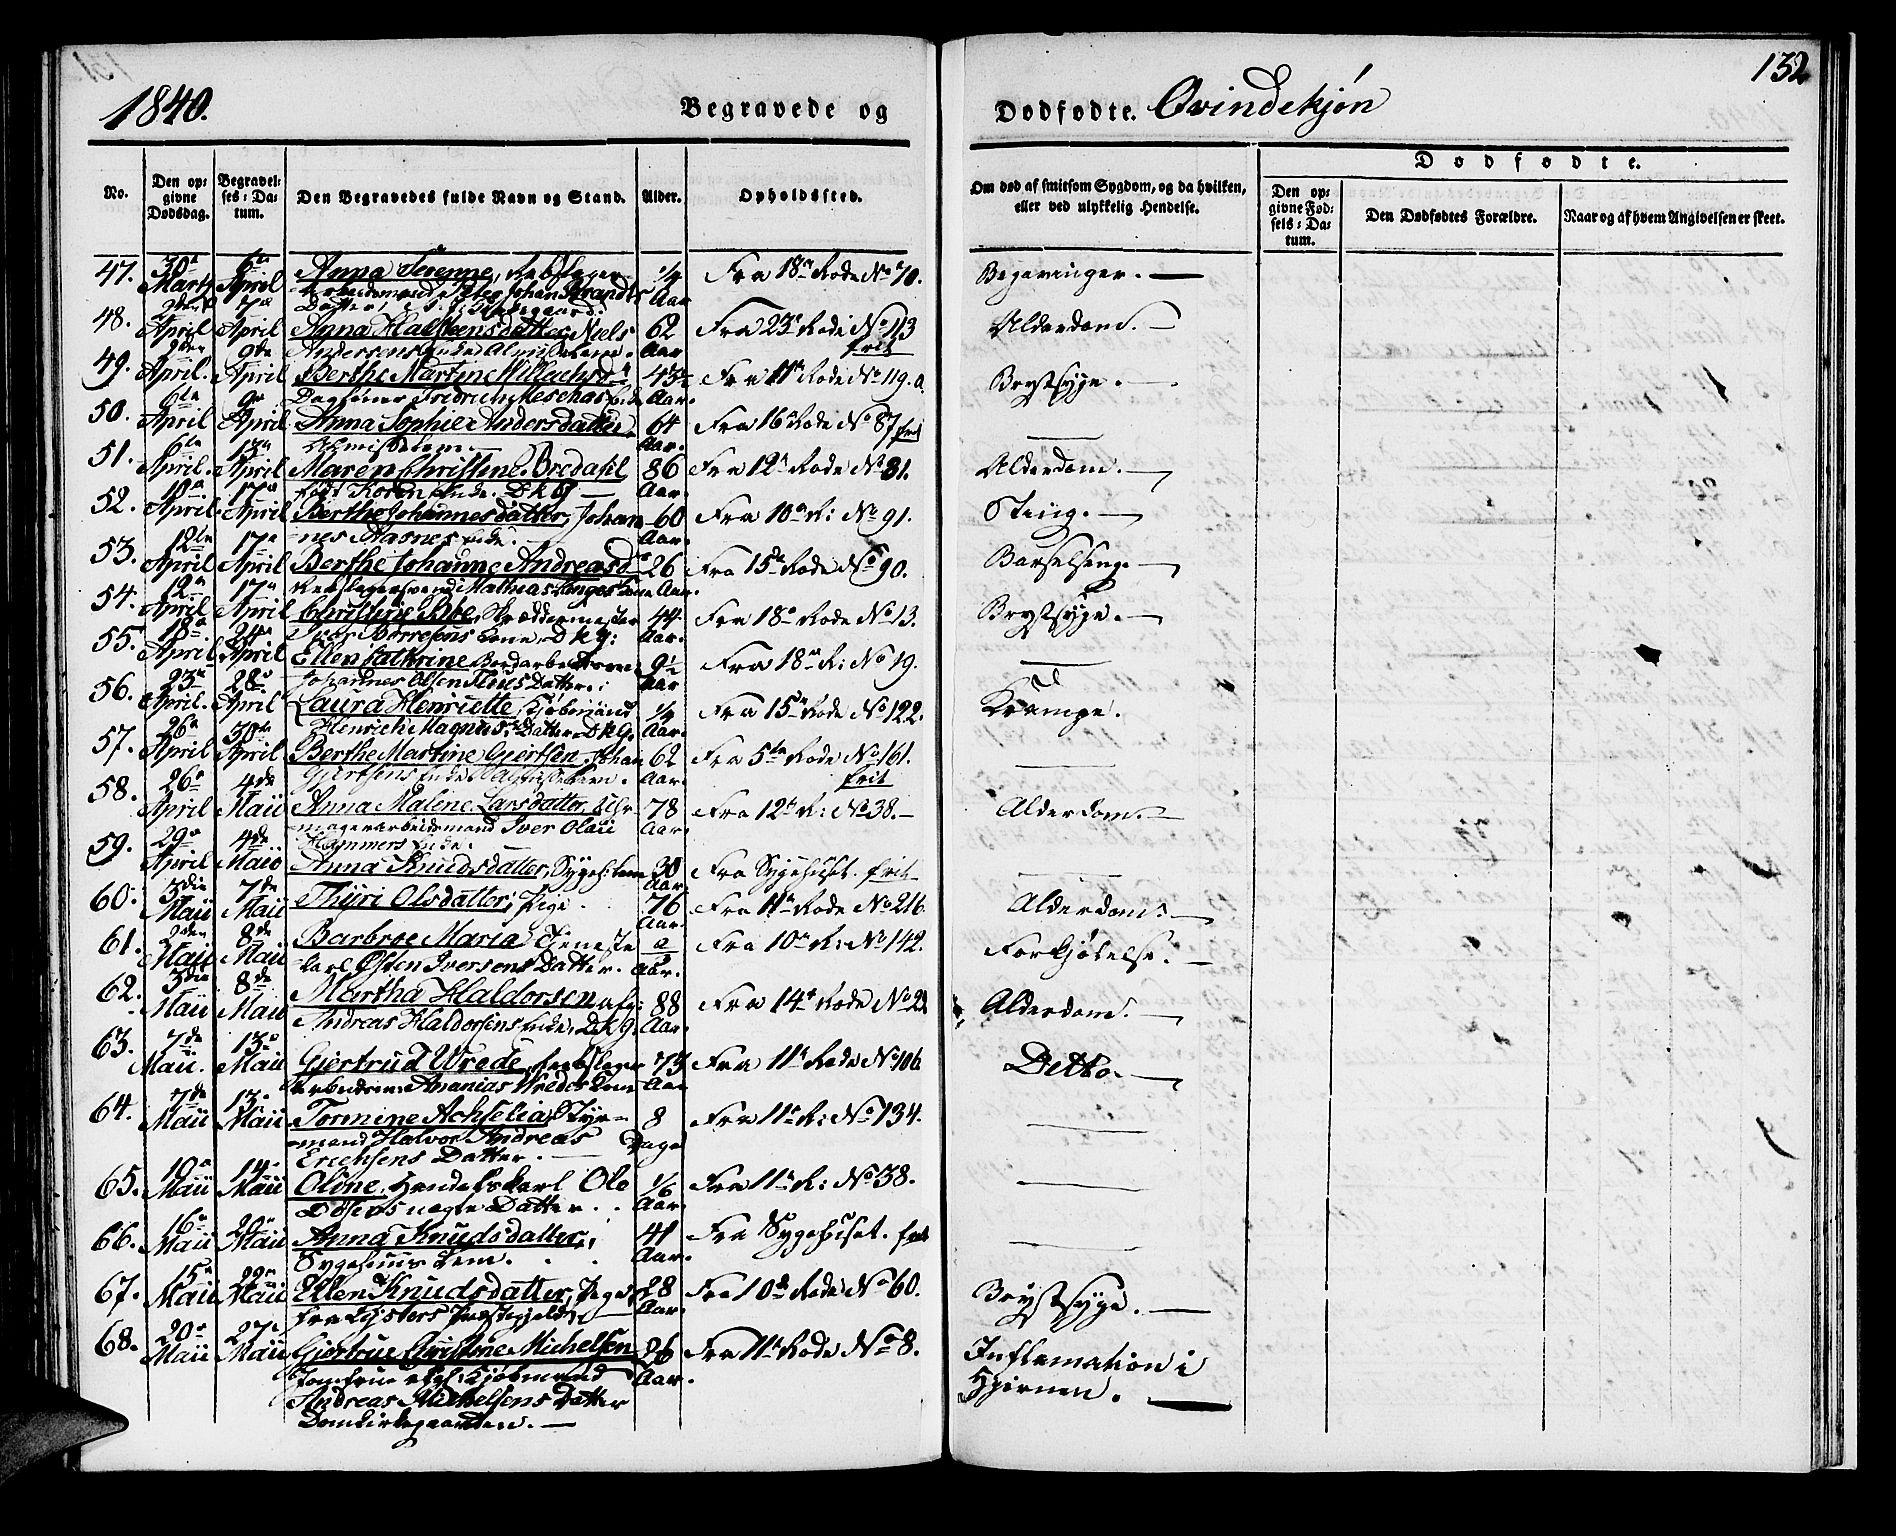 SAB, Domkirken sokneprestembete, H/Haa/L0015: Ministerialbok nr. A 14, 1835-1840, s. 132